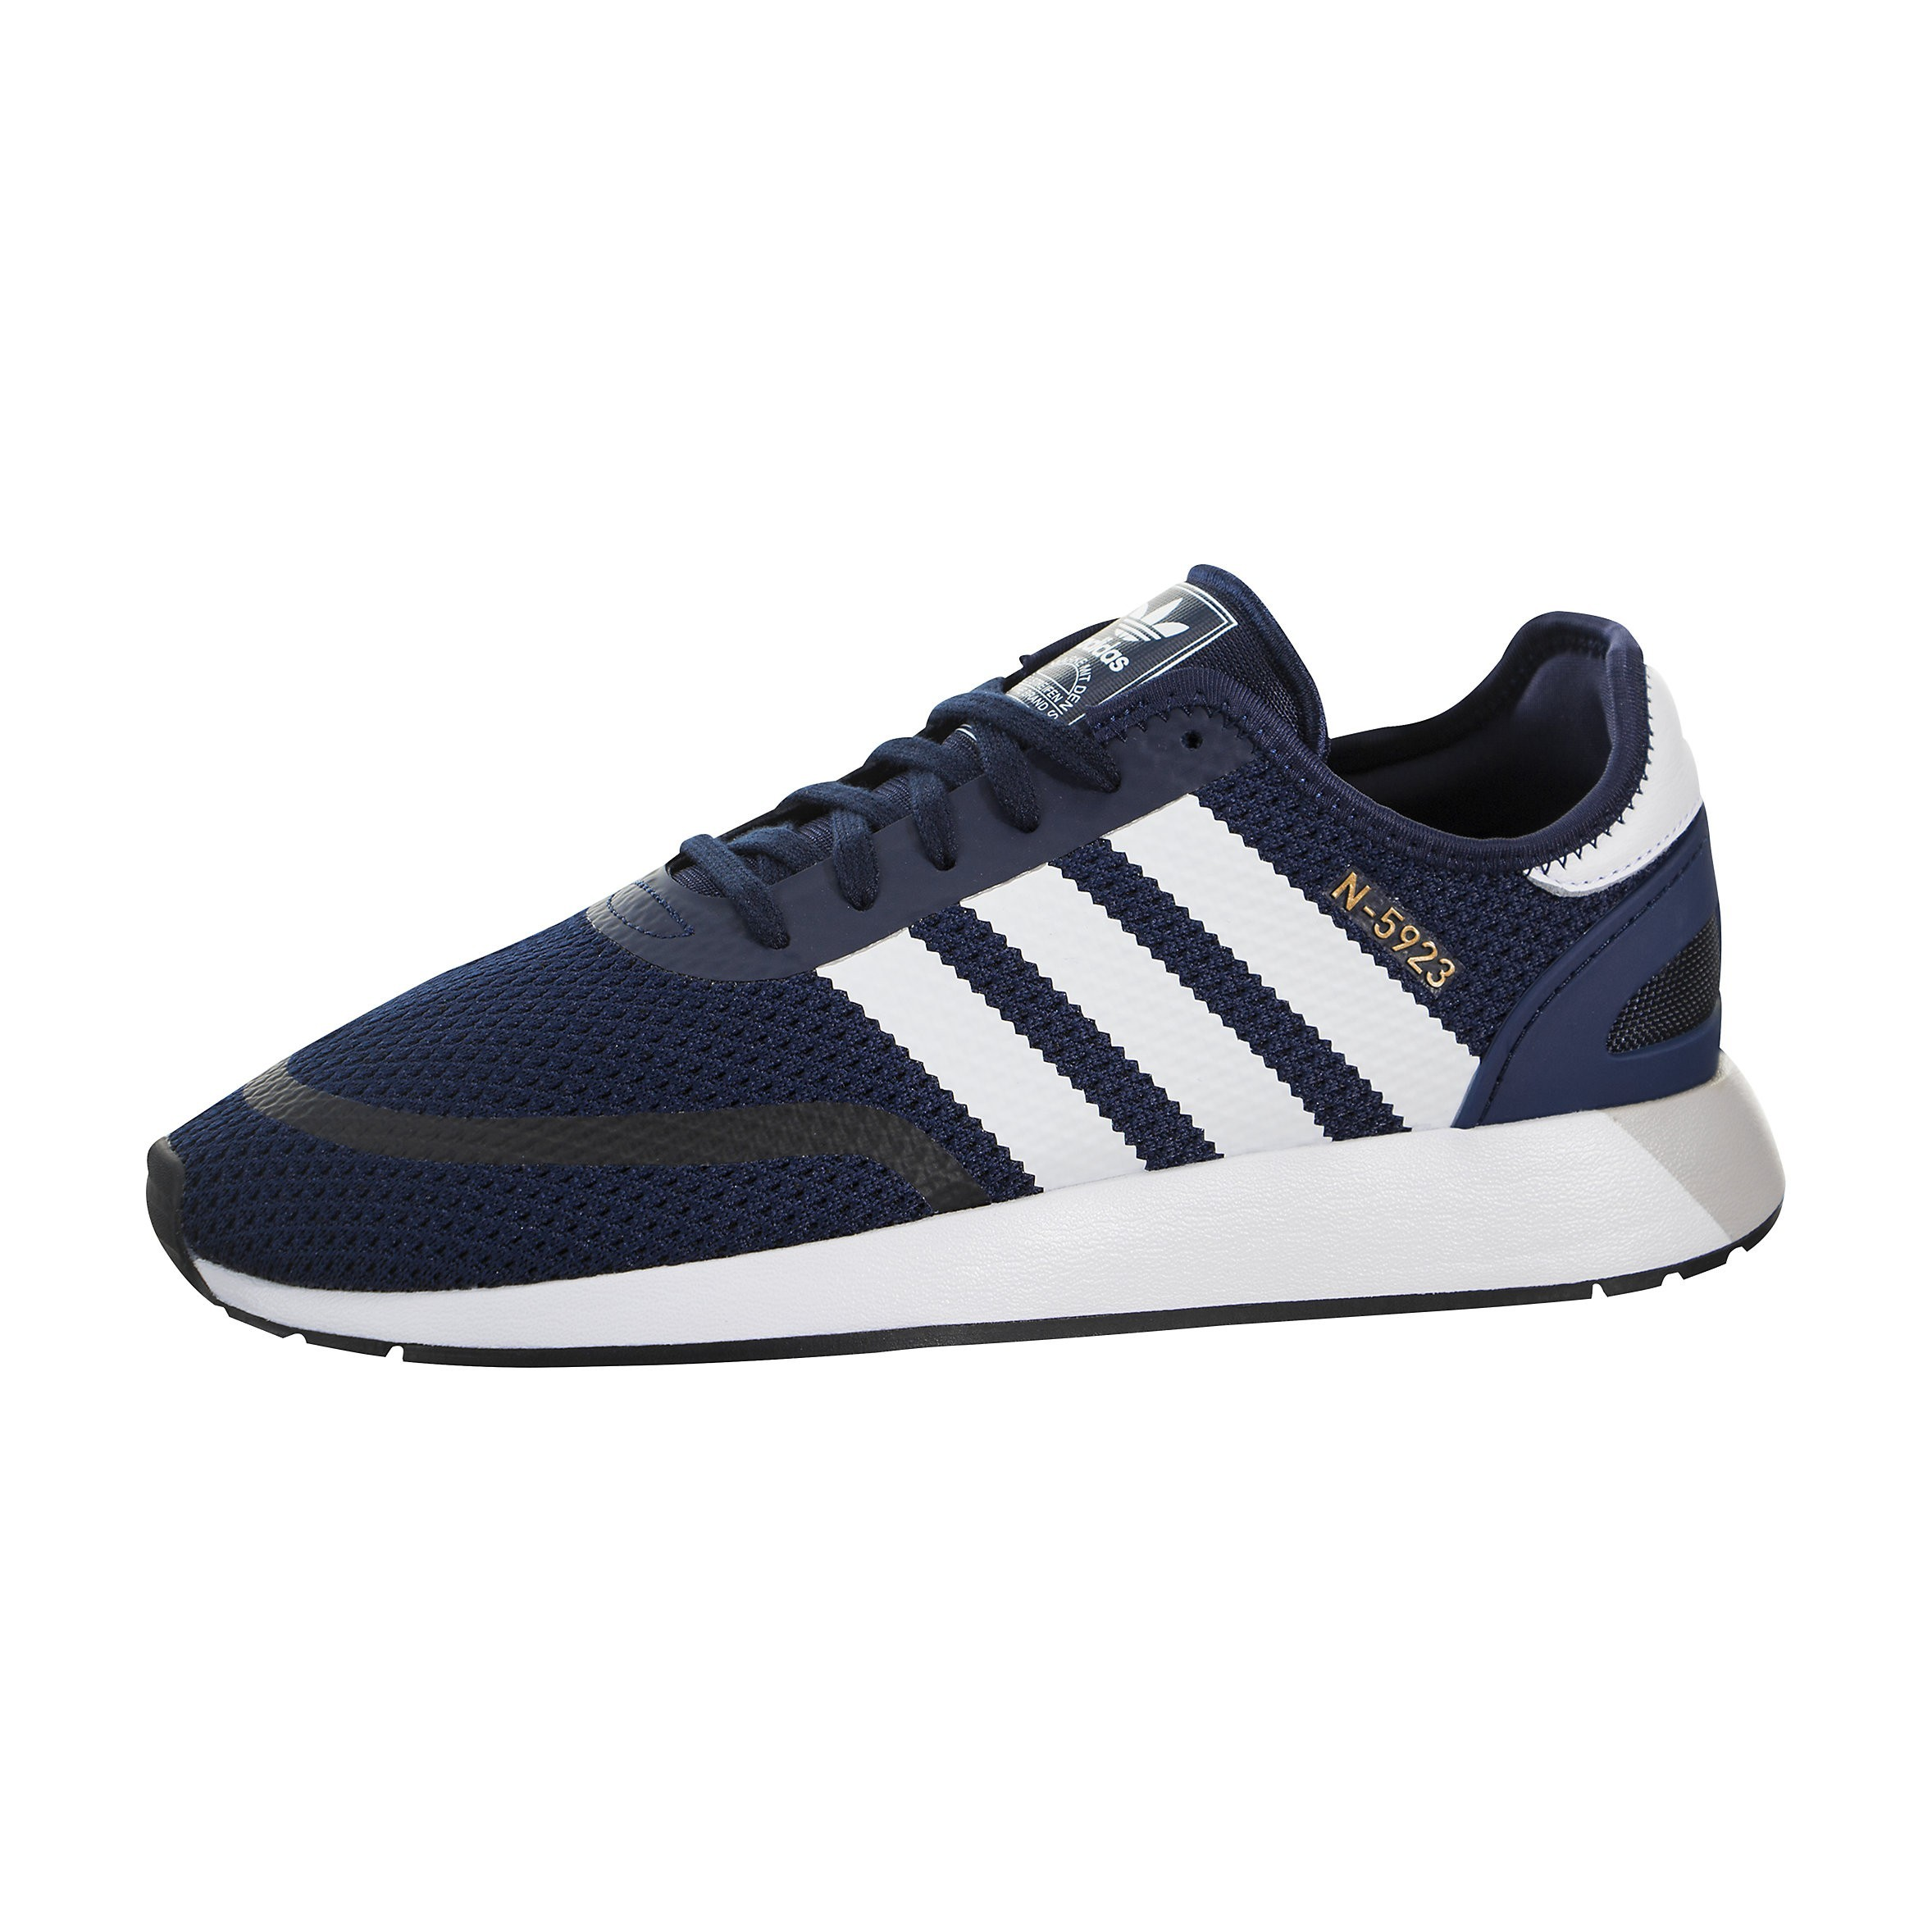 Adidas Originals N-5923 Azules Iniki DB0961 Hombre